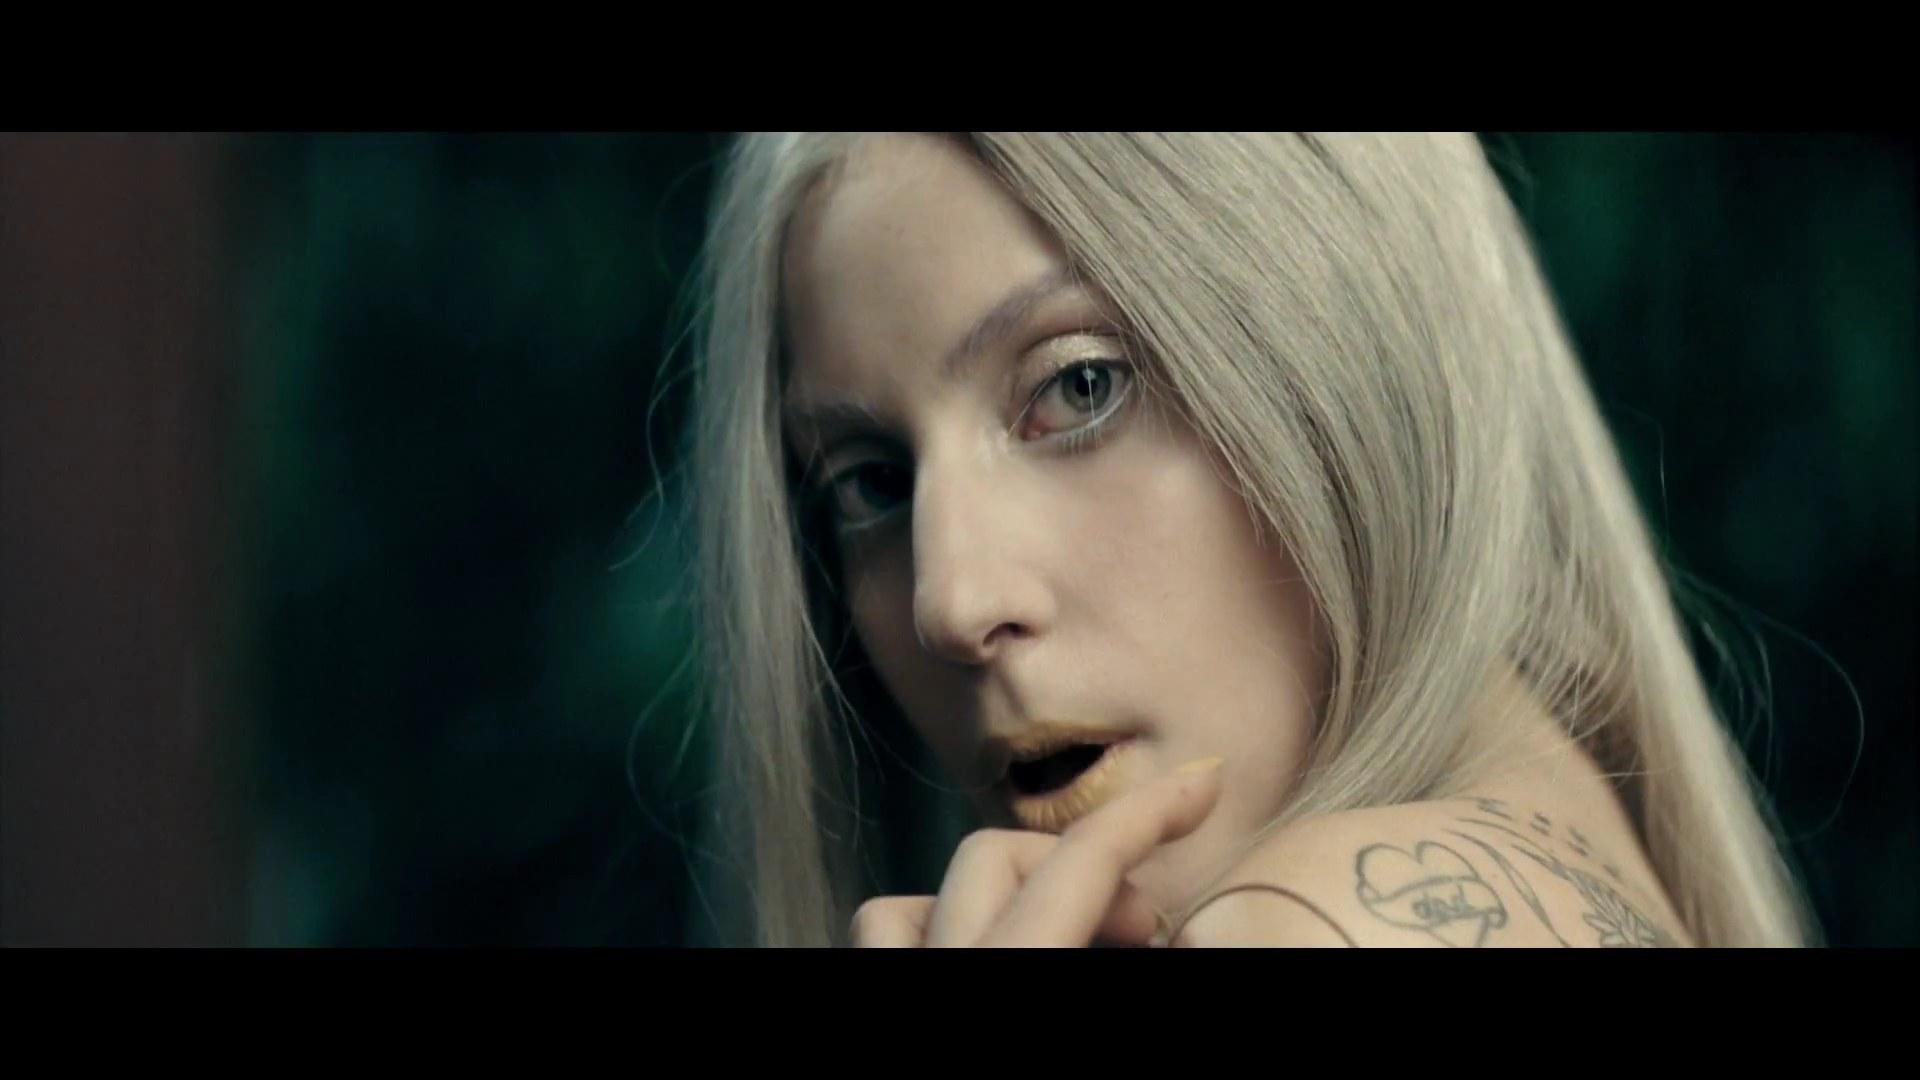 You And I  Lady Gaga Image (24639208)  Fanpop